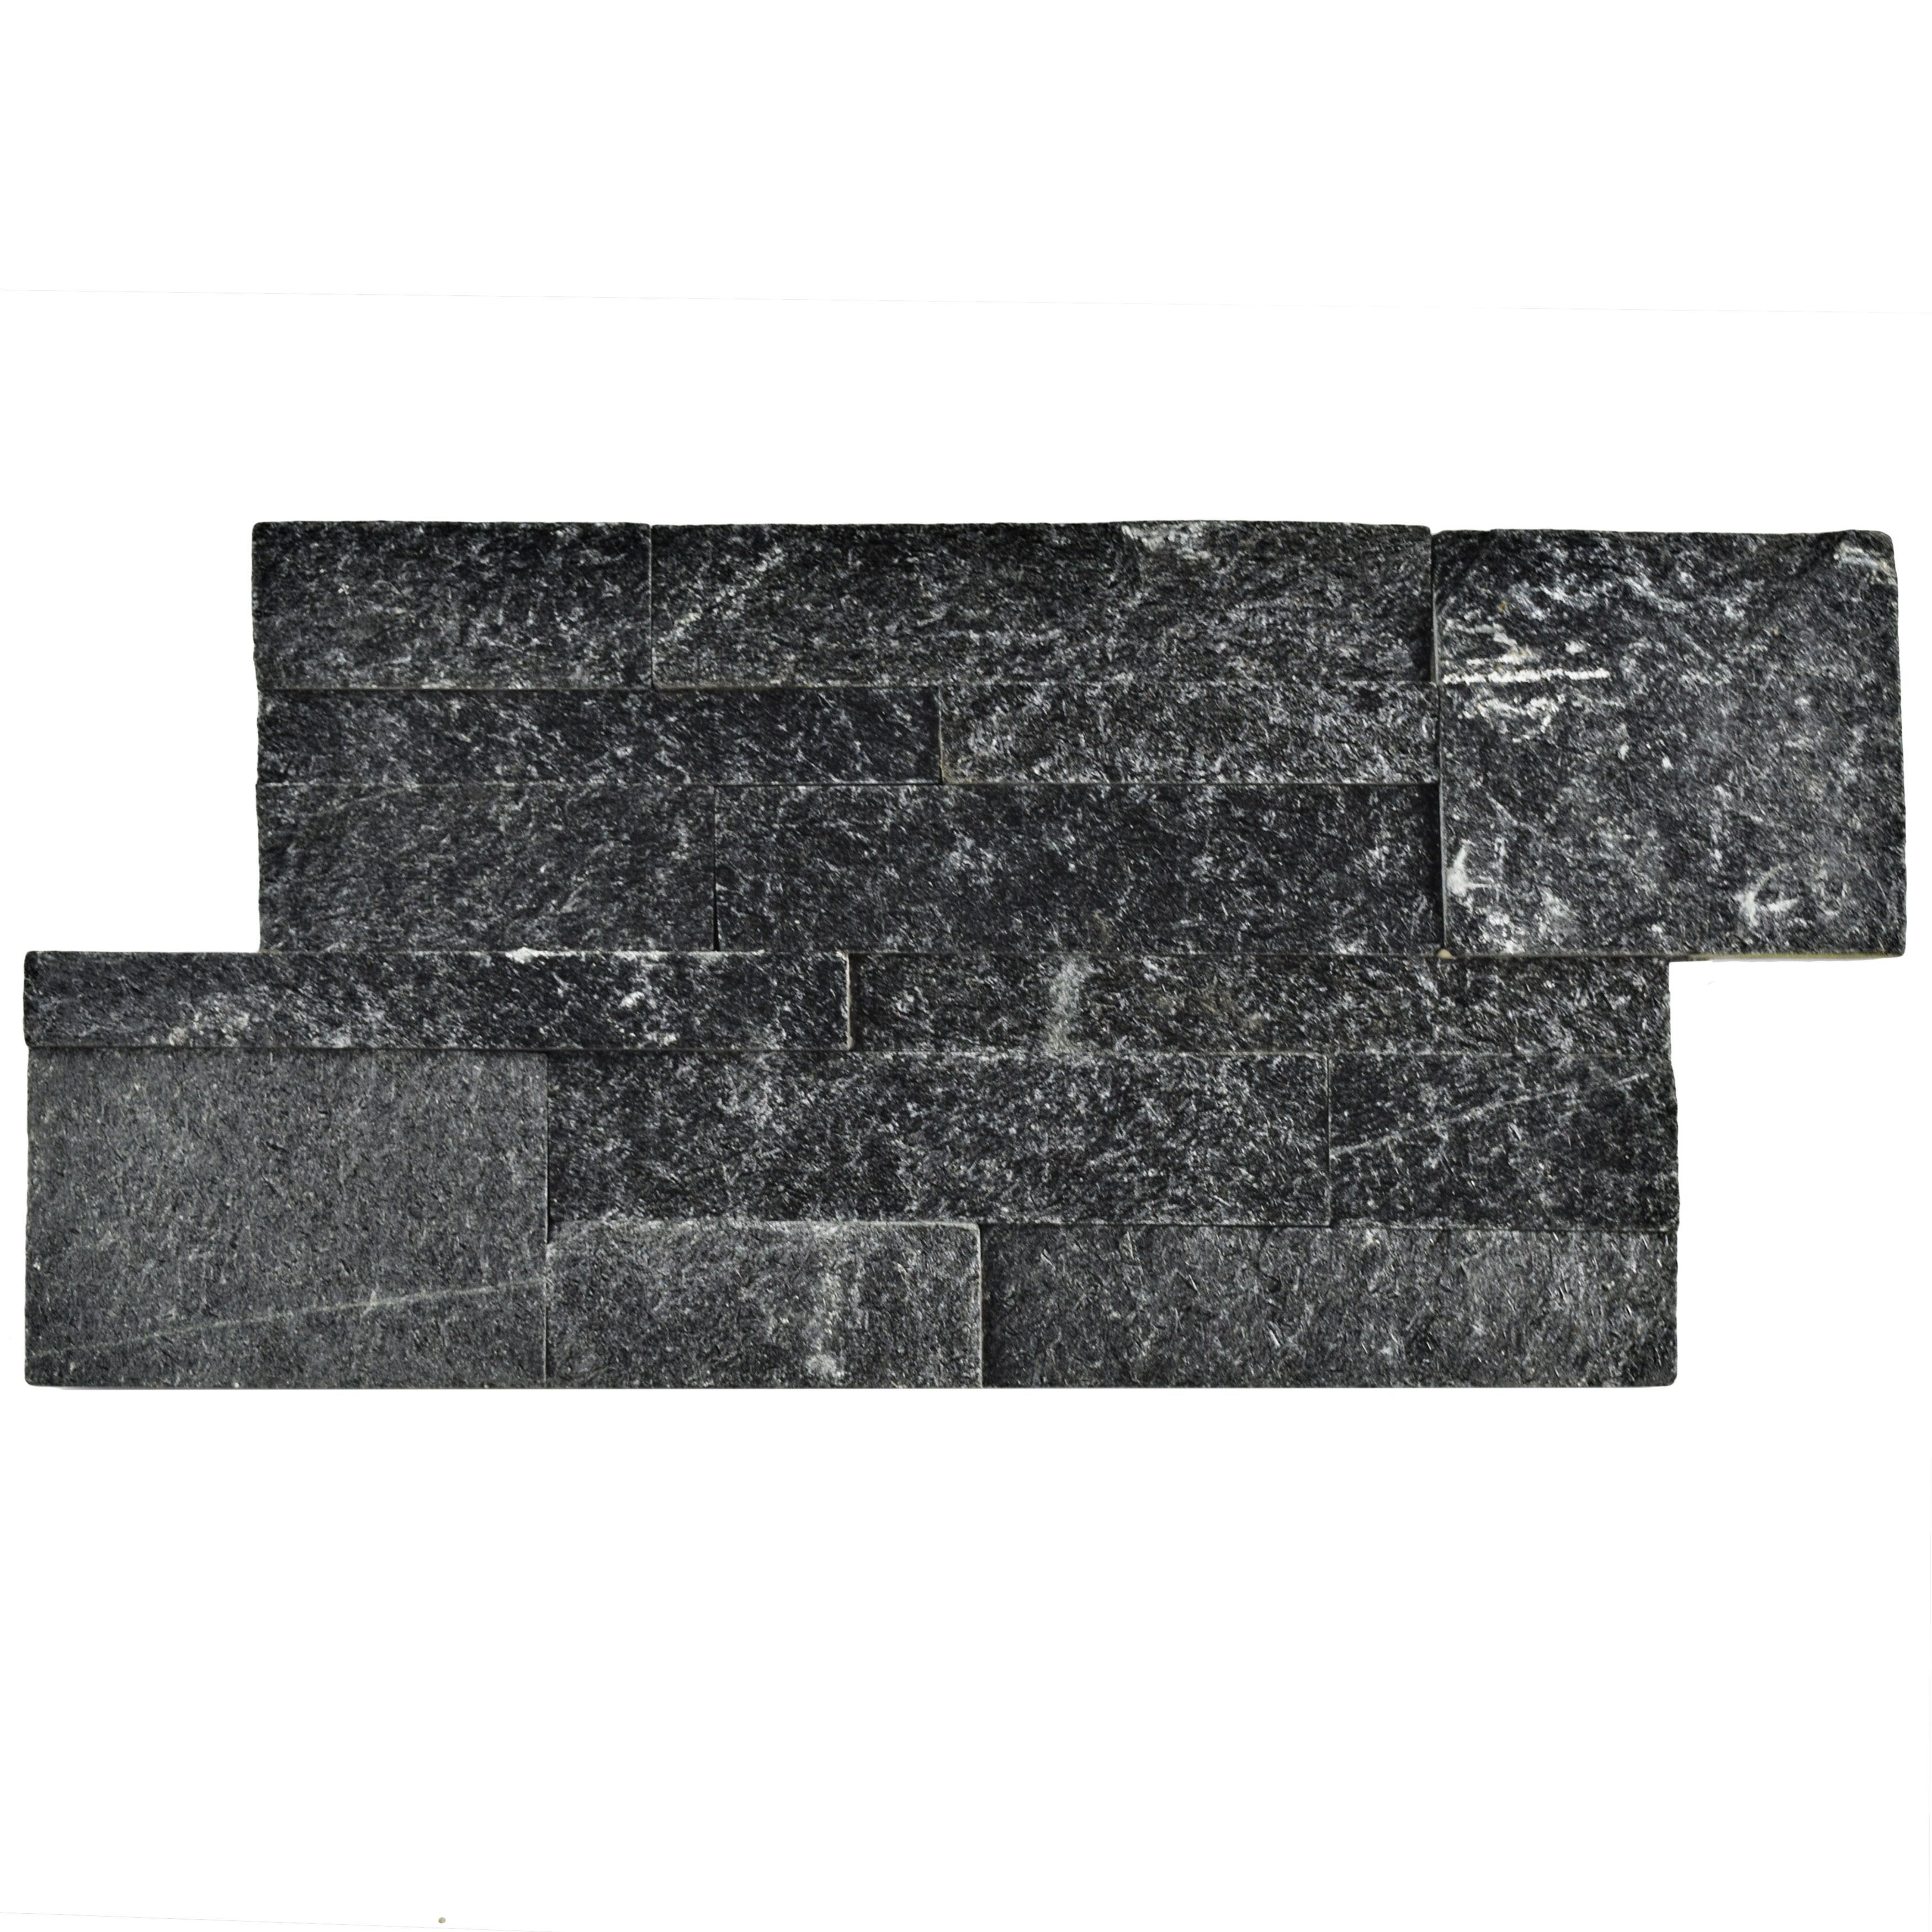 Somertile 7x13 5 Inch Piedra Quartzite Stone Wall Tile